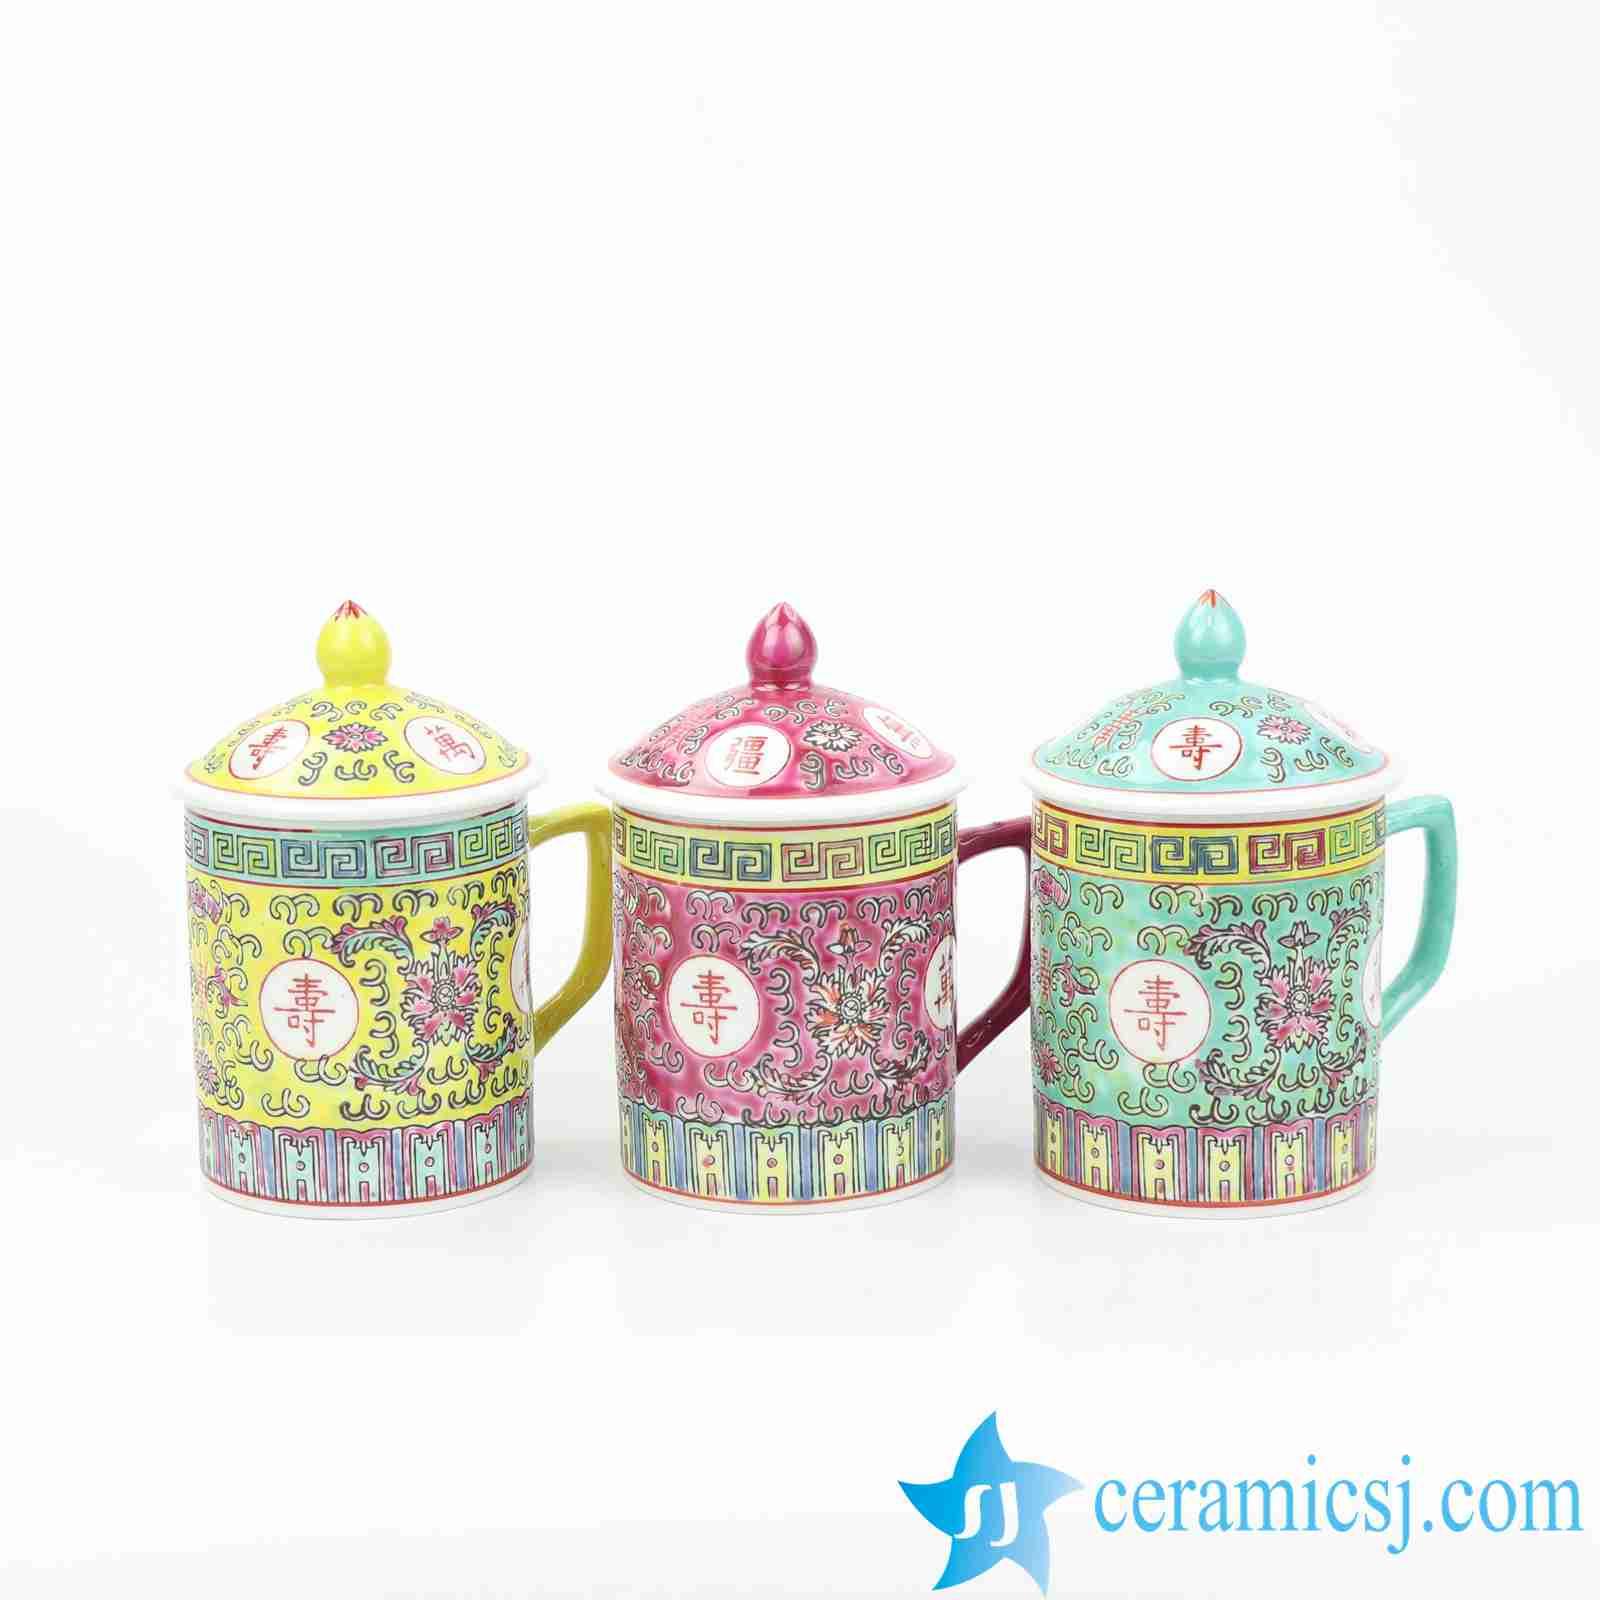 longevity teacup